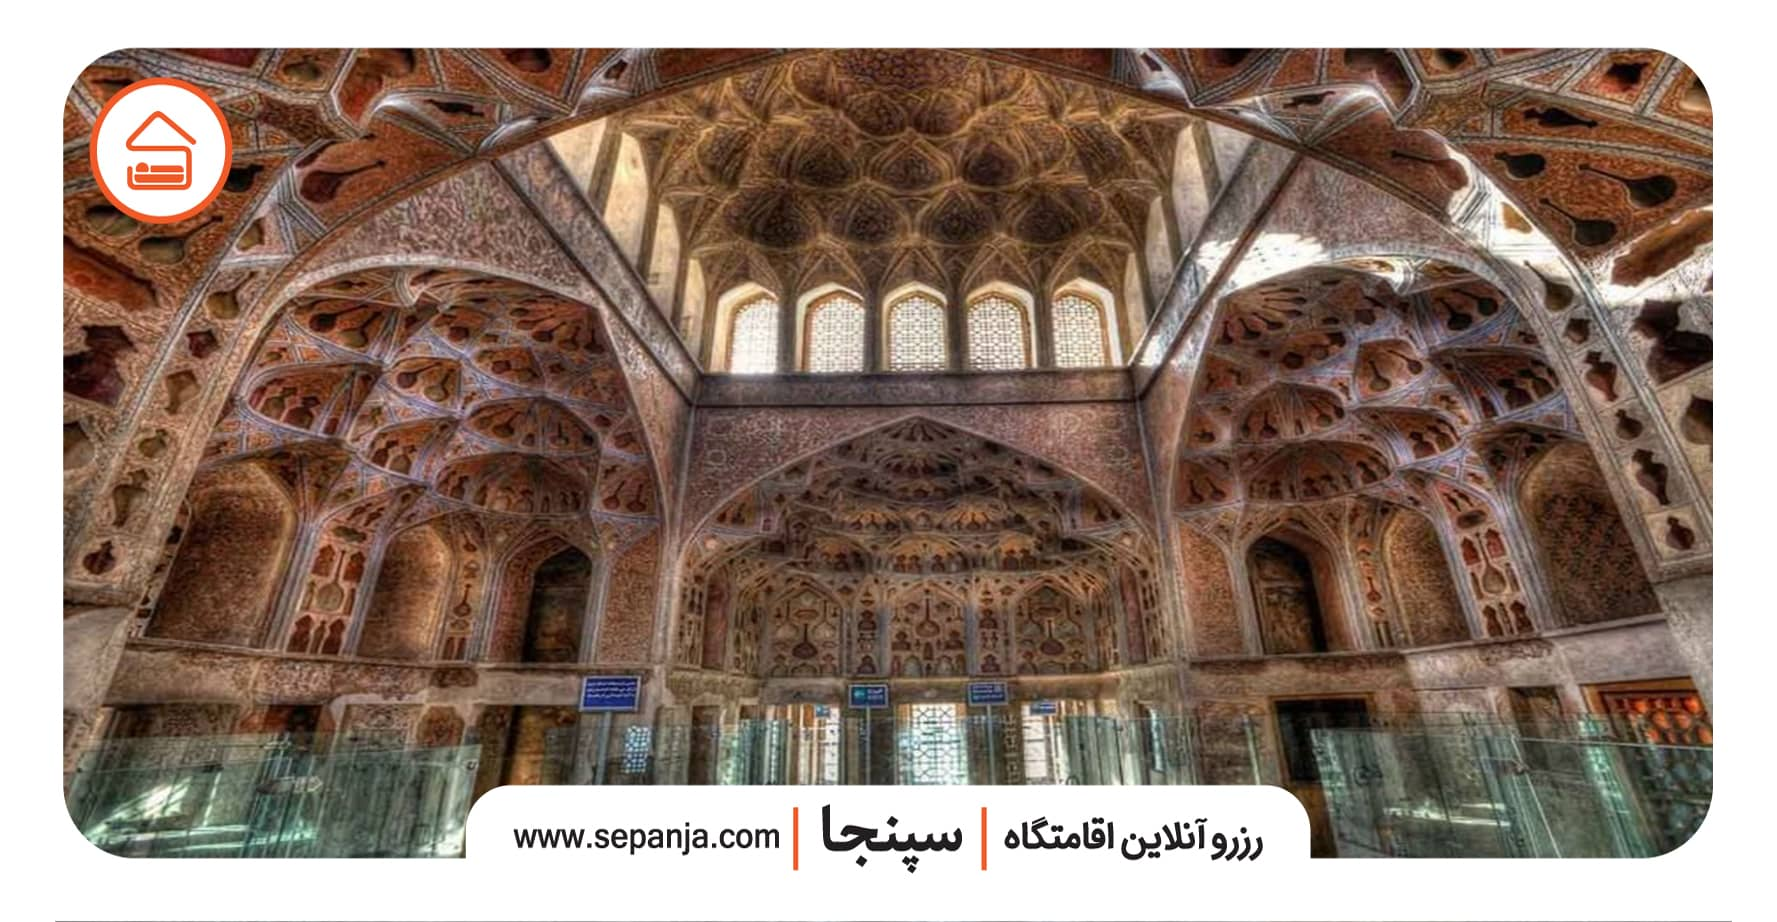 معماری عمارت عالی قاپو اصفهان